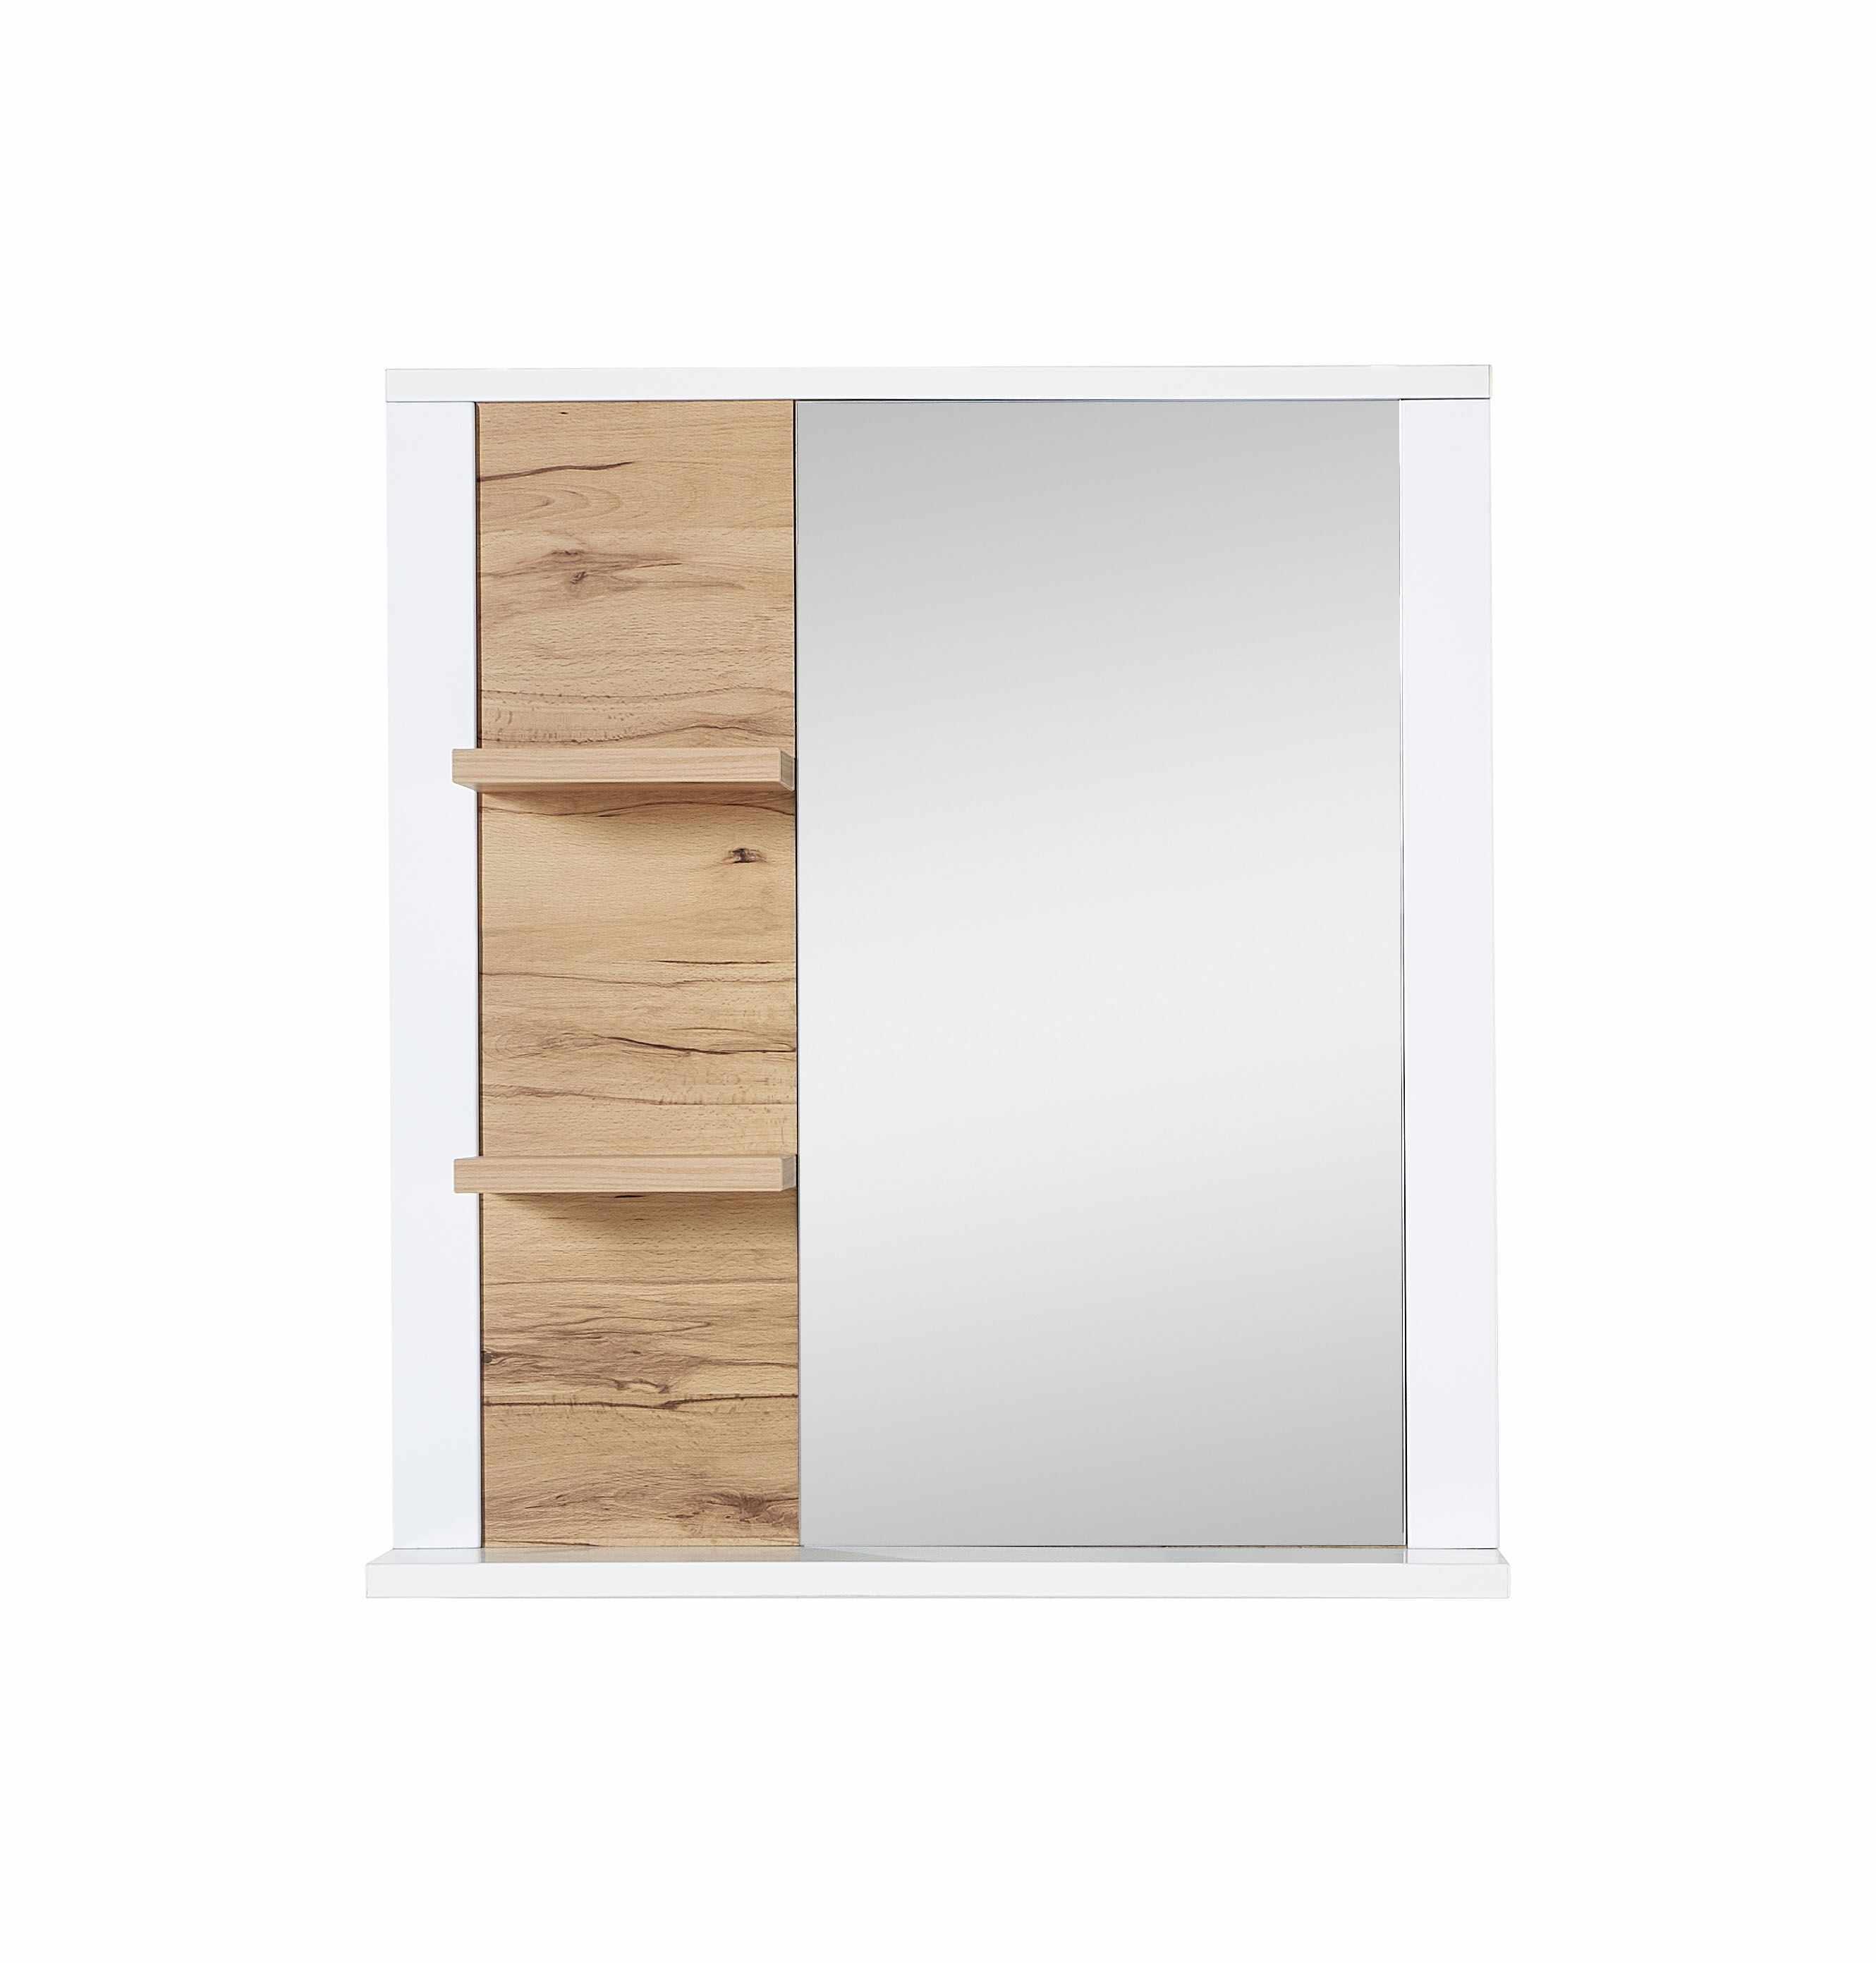 Oglinda decorativa cu 2 etajere din pal si MDF, Selina Alb / Natur, l73xA15xH80 cm la pret 450 lei